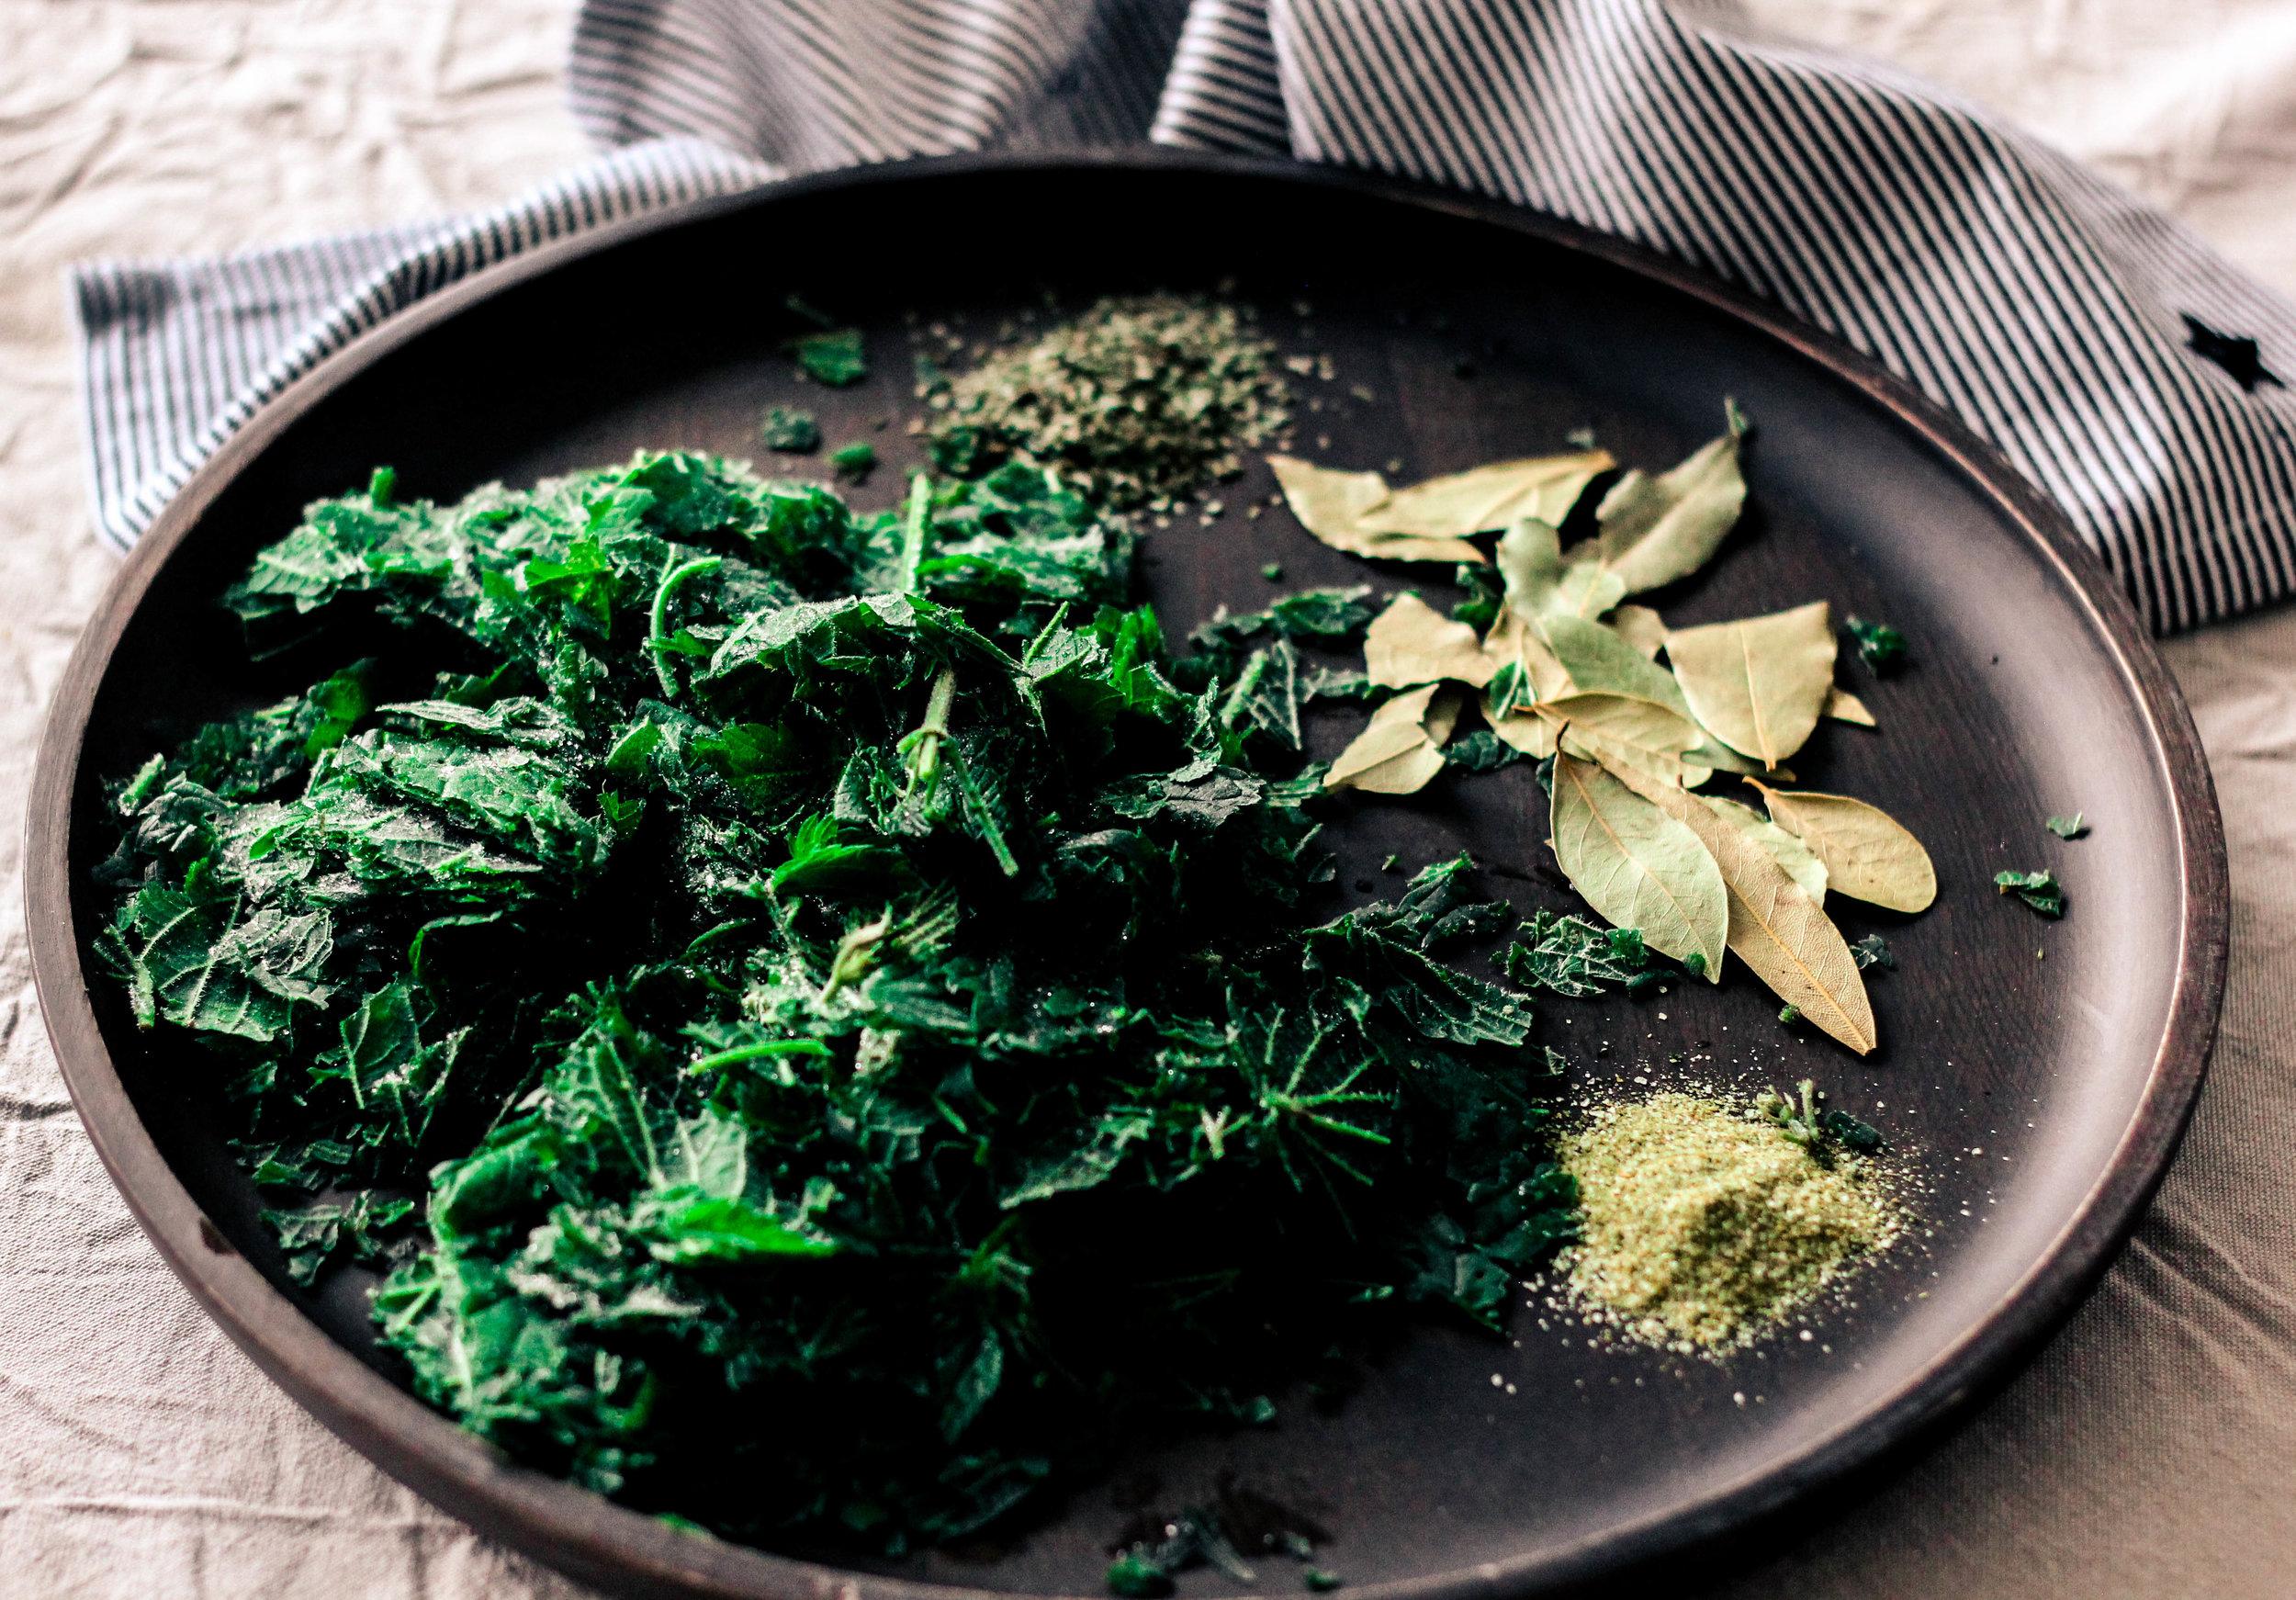 Healthy detox and natural cleanse leafy greens and herbs Photo Linda Haggh.jpg